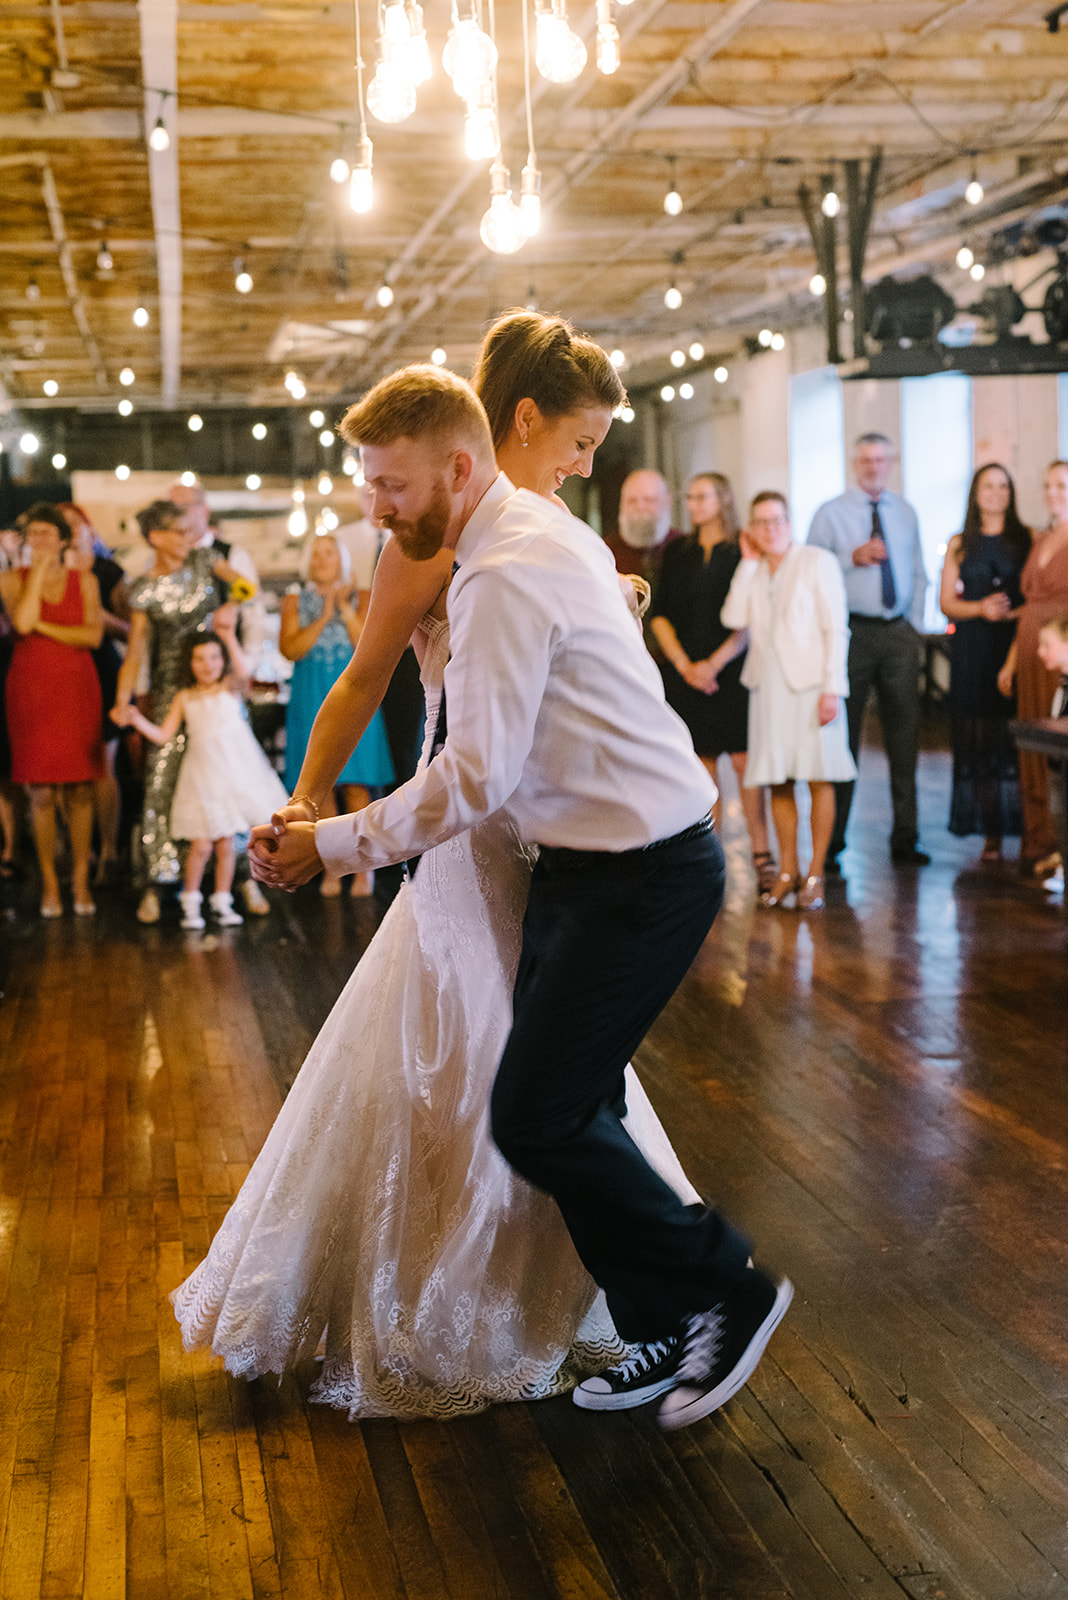 Art Factory Wedding- Industrial Chic- Audrey+Ryan- Paterson NJ- Olivia Christina Photo (59).jpg